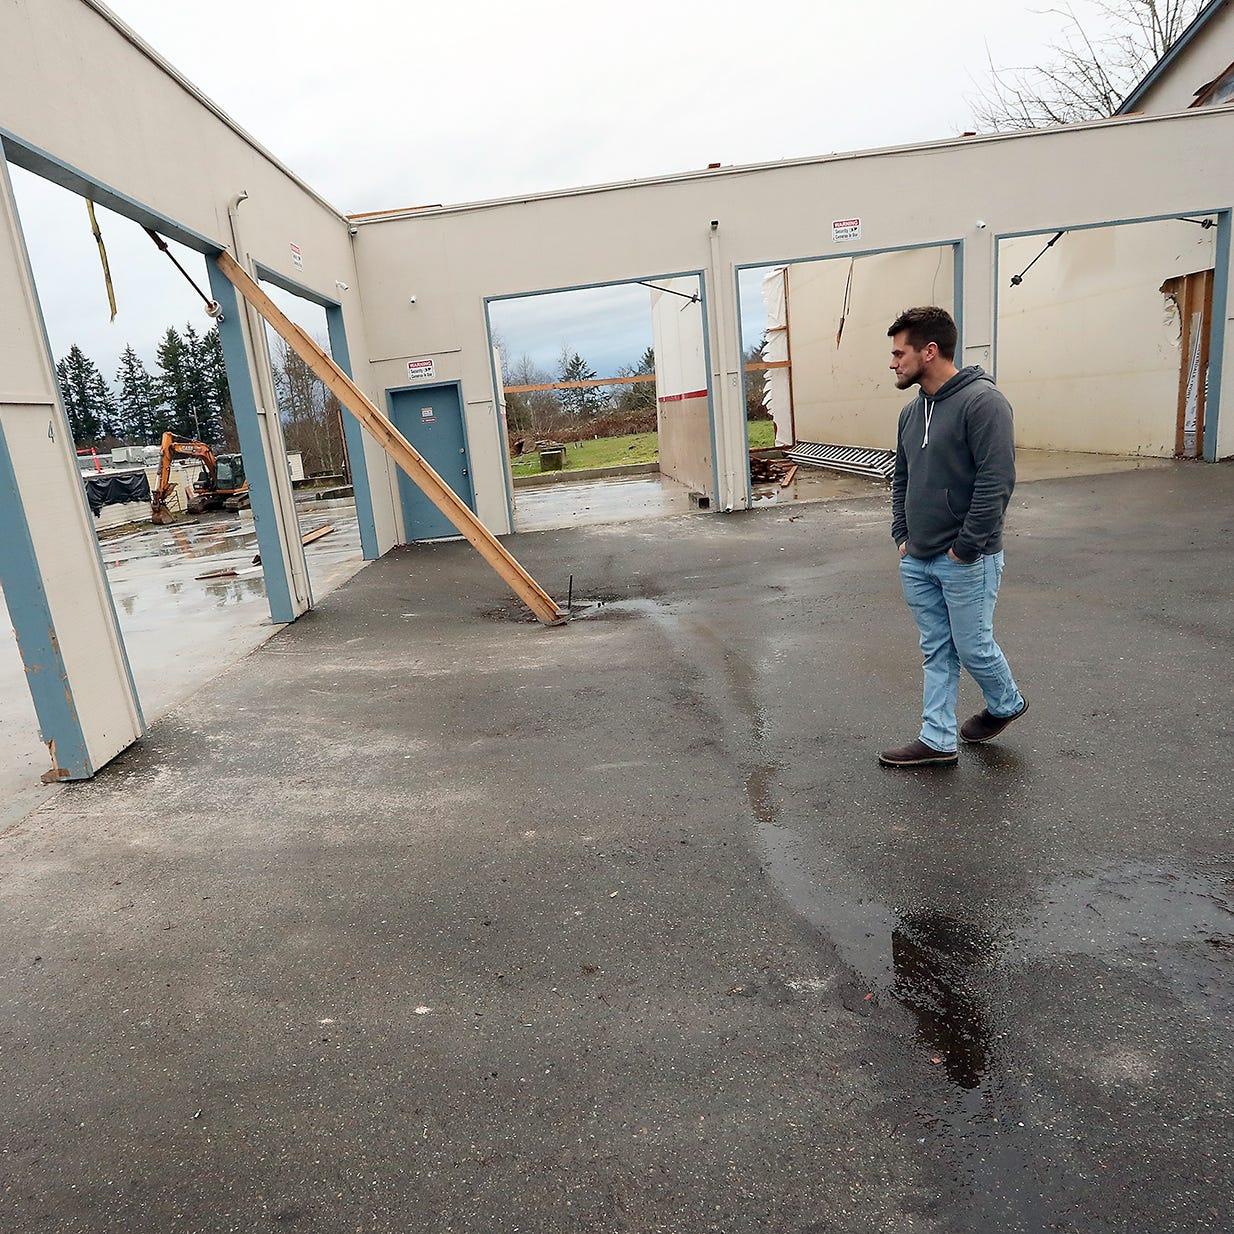 Port Orchard tornado victims navigating insurance claims